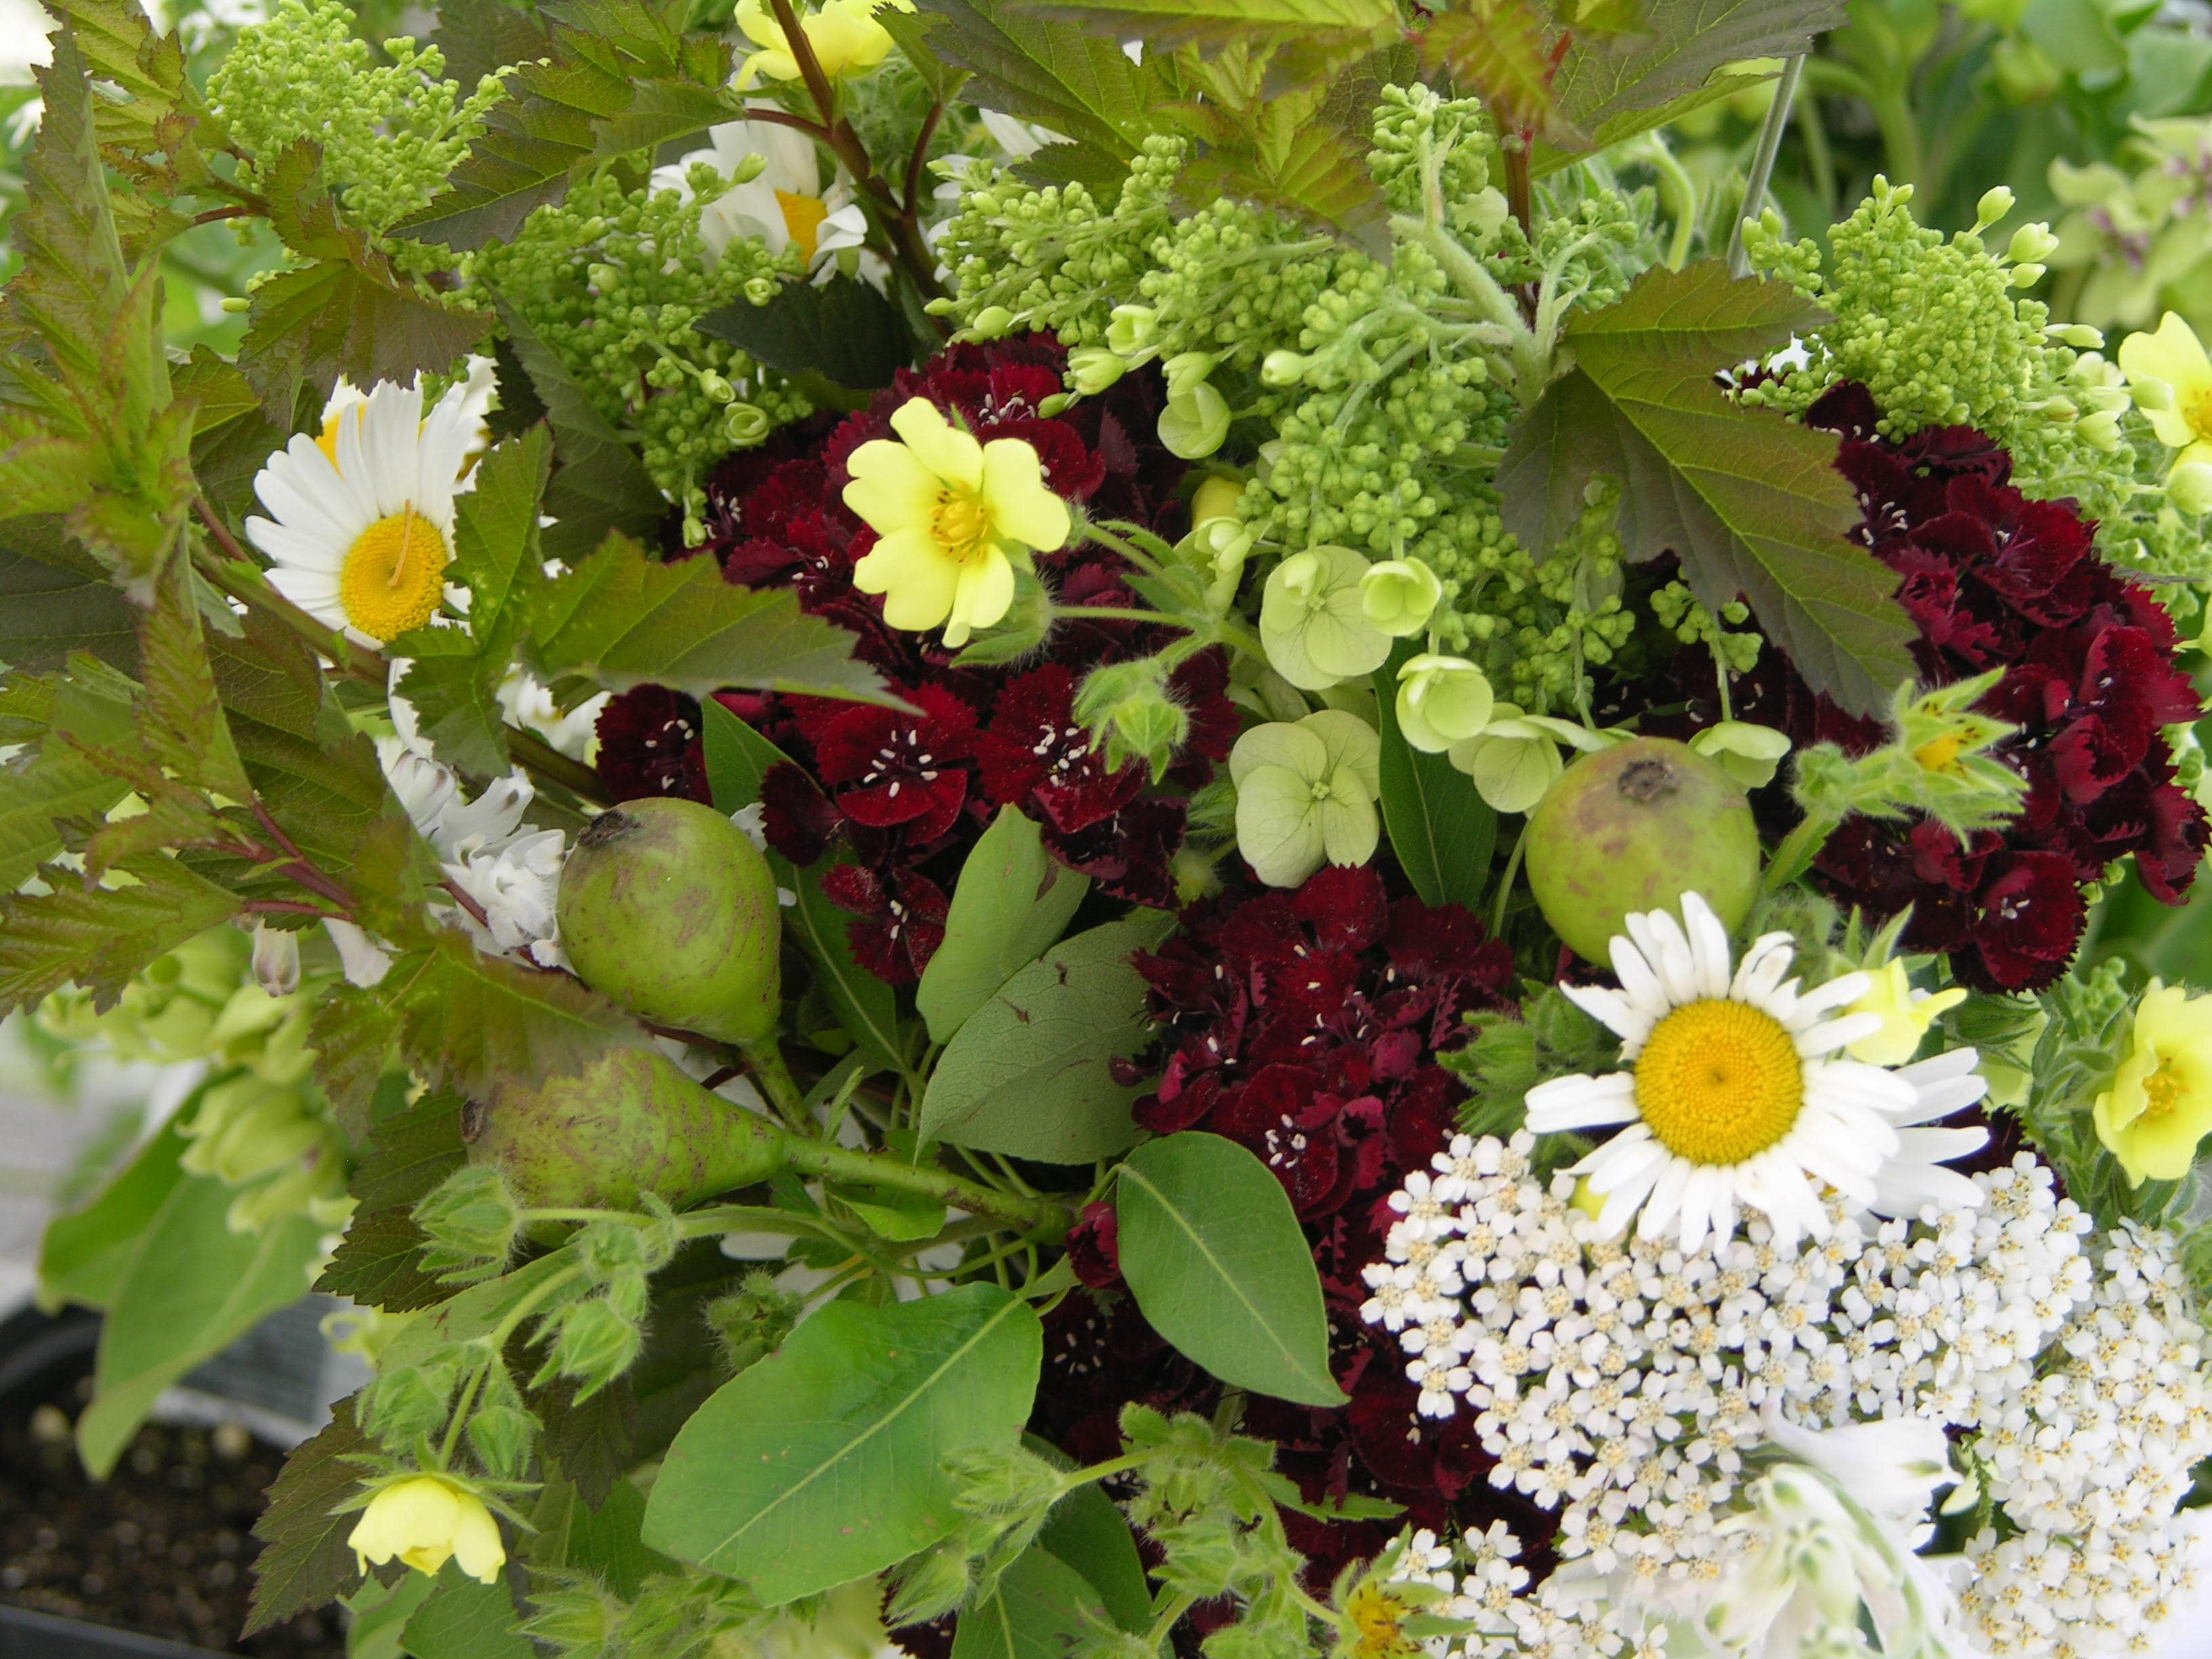 https://0201.nccdn.net/4_2/000/000/046/6ea/flower-bouquet-2010-3-min-3264x2448.jpg